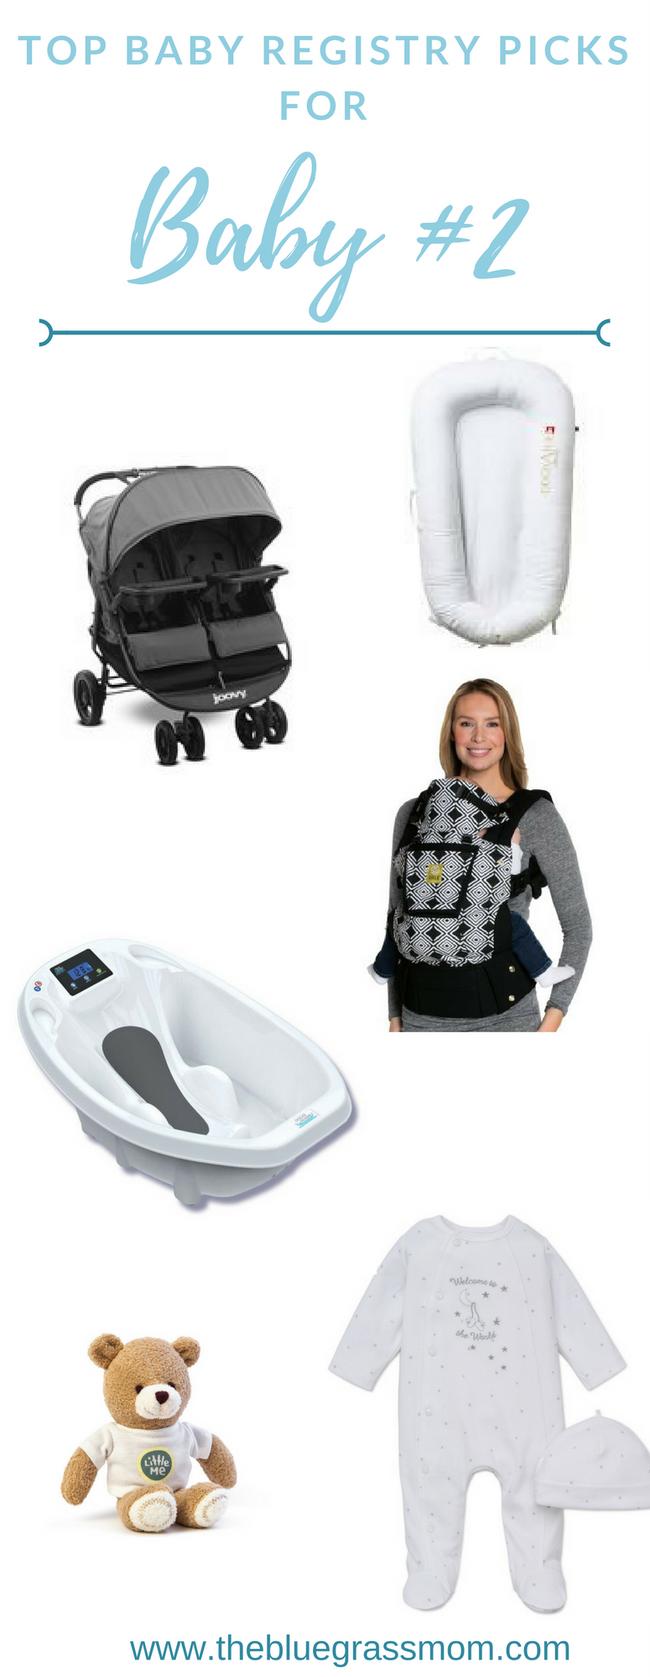 Top Baby Registry picks for Baby #2